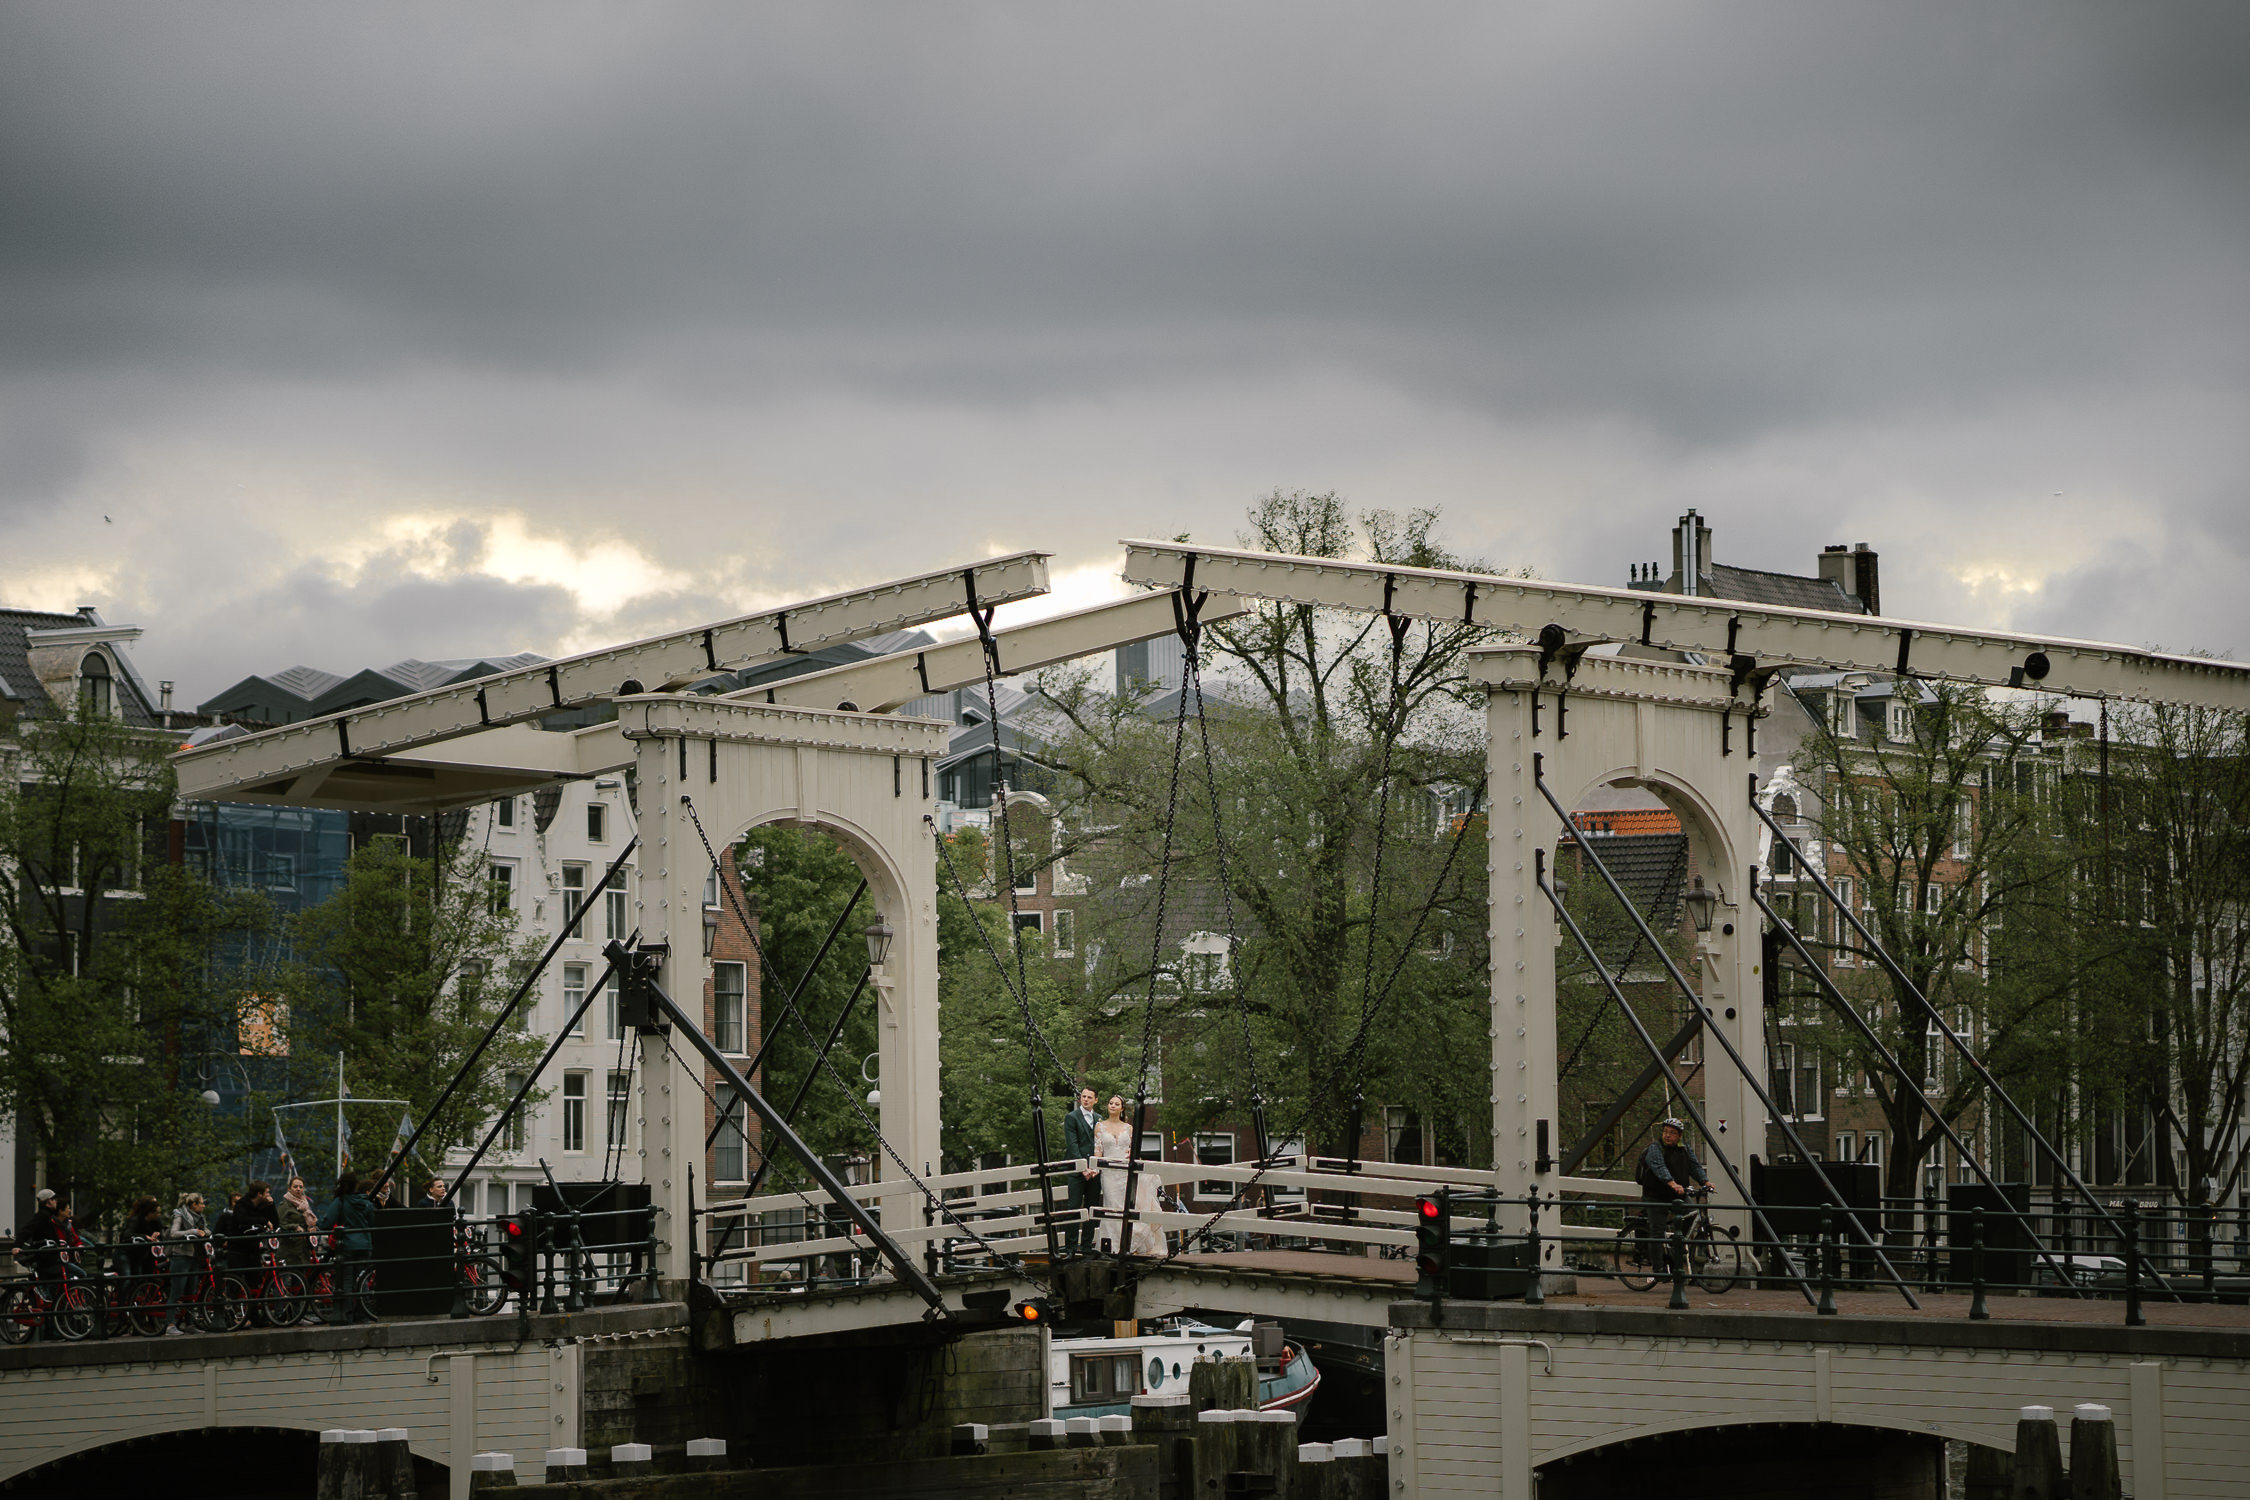 trouwfotograaf amsterdam magere brug foto